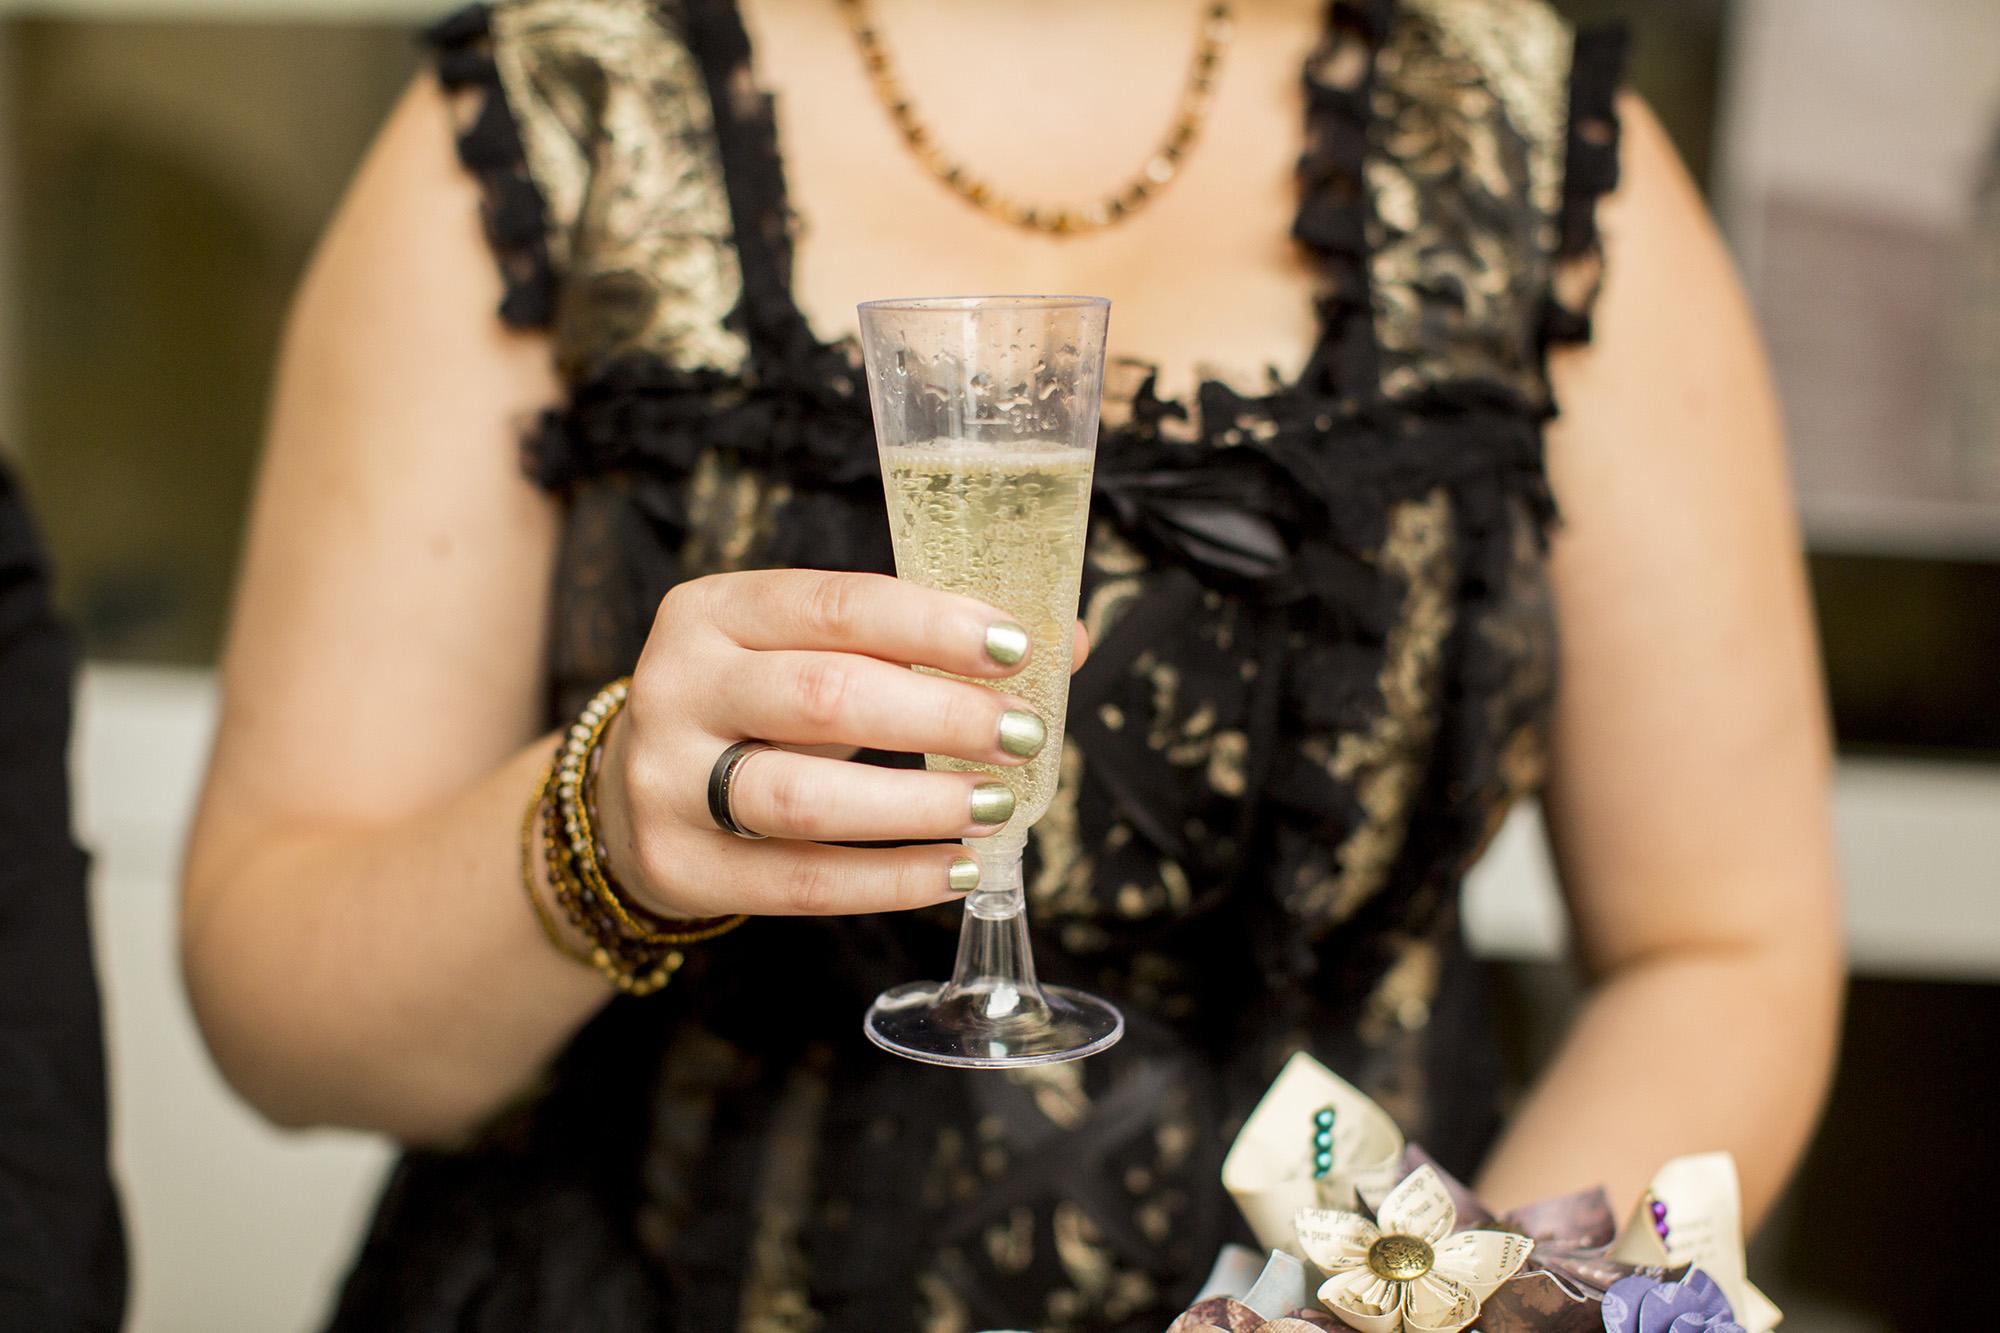 Seriously_Sabrina_Photography_Essen_Germany_RocknRoll_Hochzeit_Wedding_PatrickJenny62.jpg